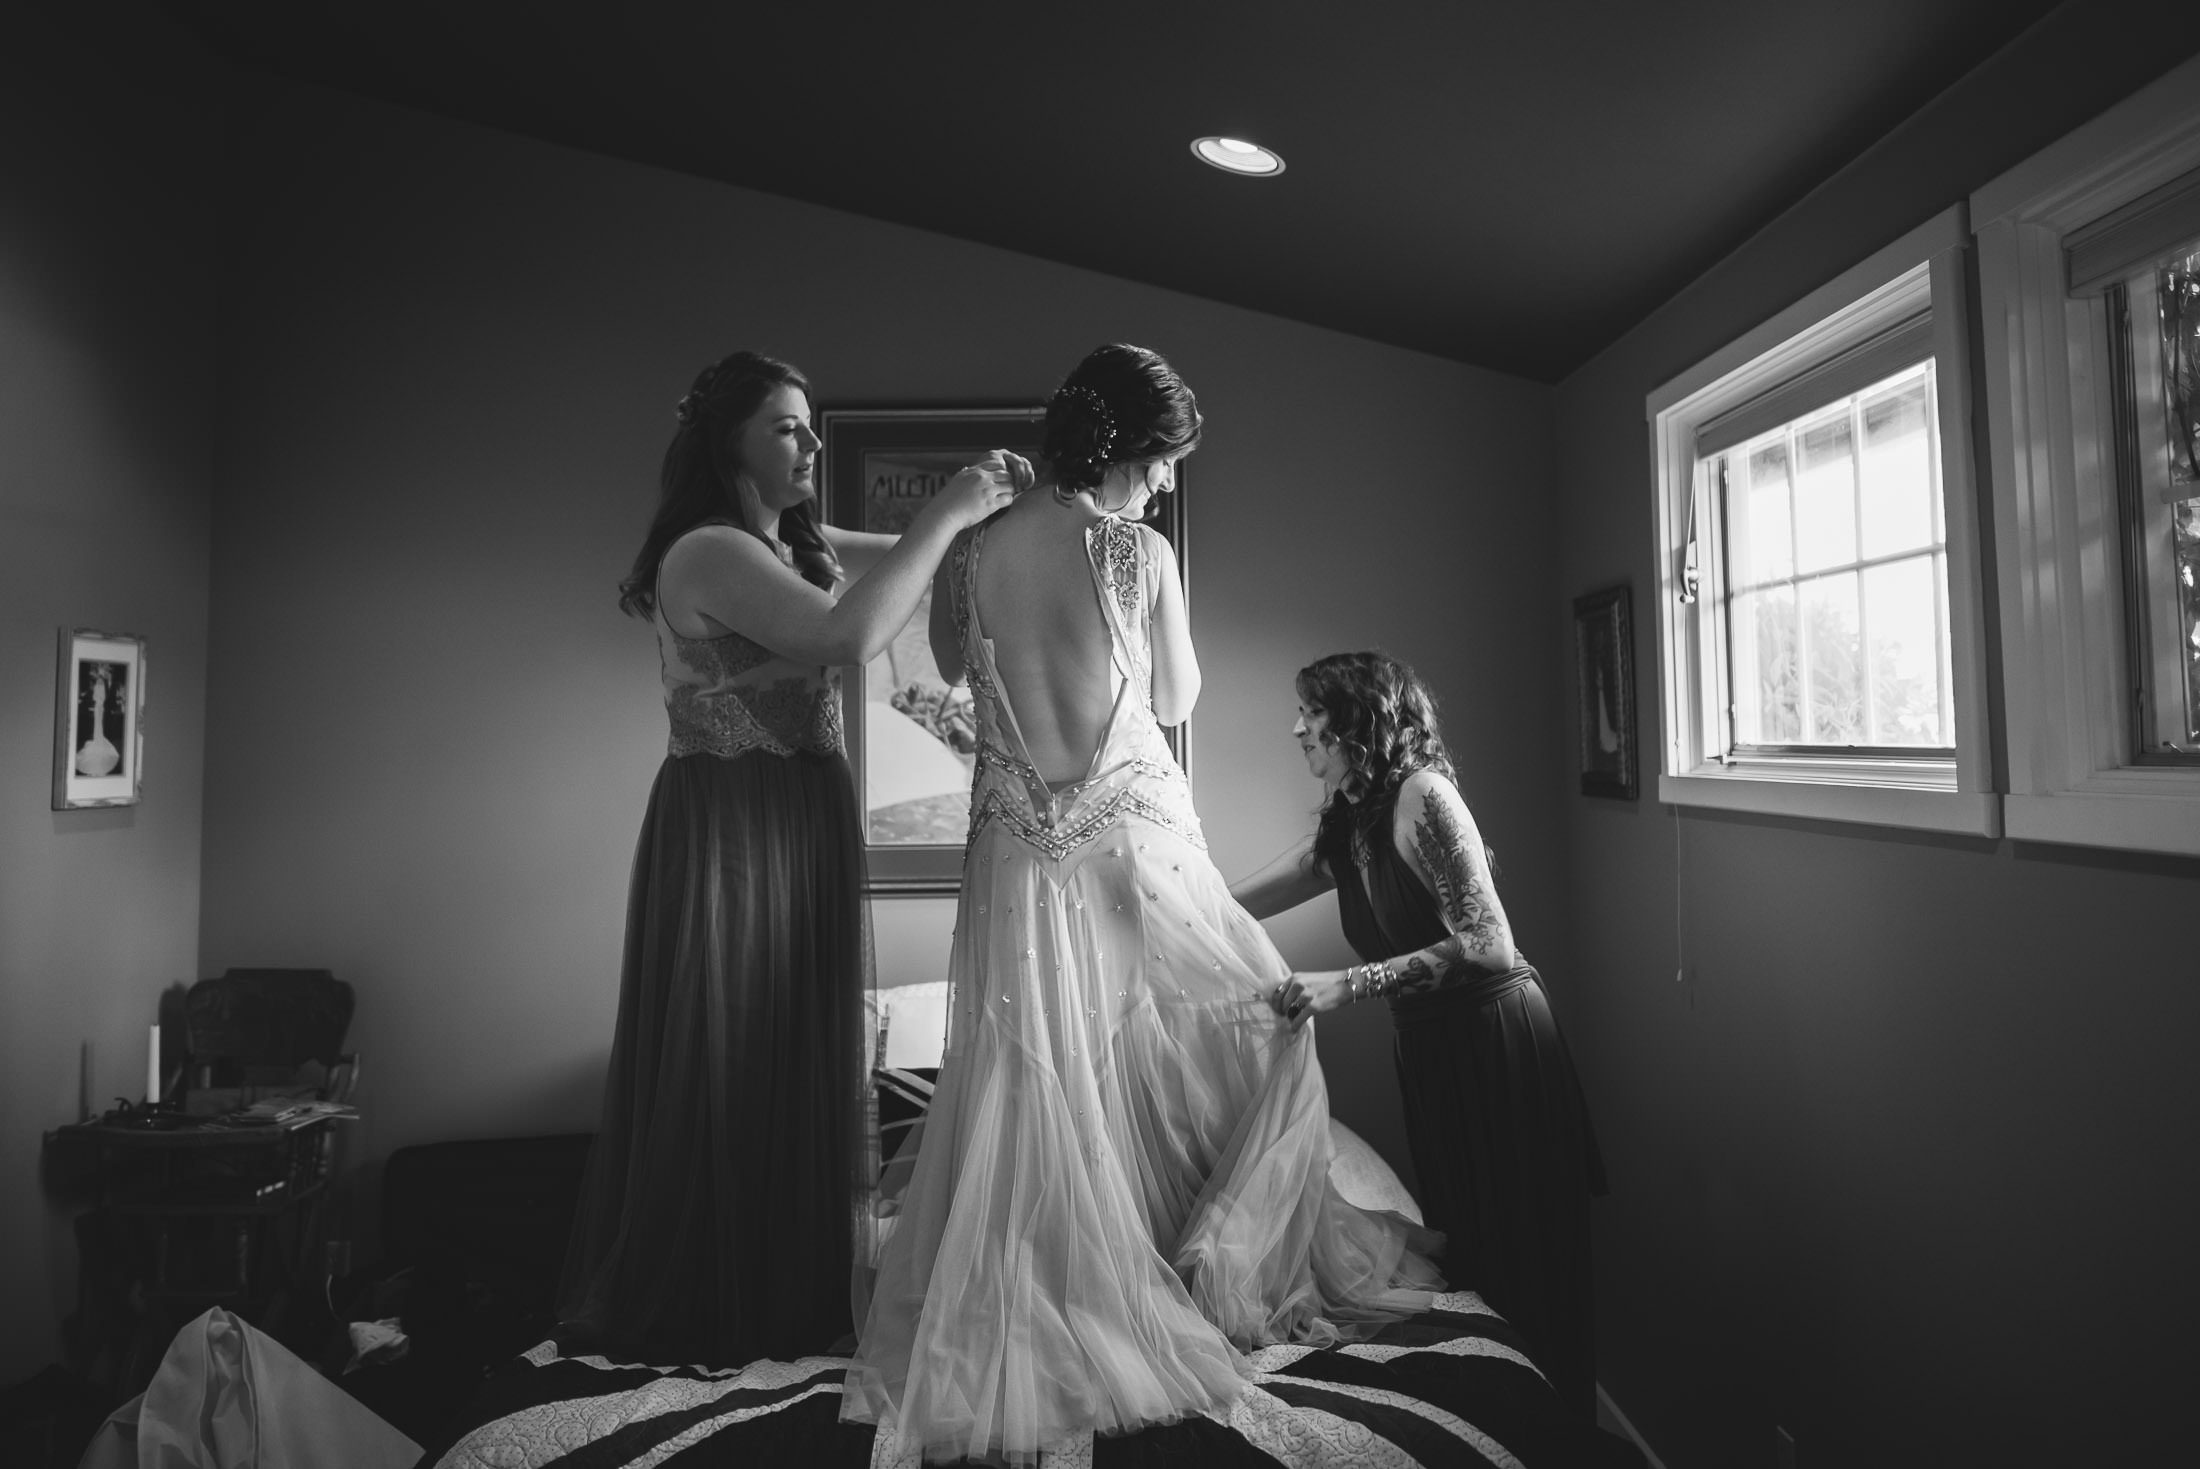 Getting Ready pic at Sebastopol wedding